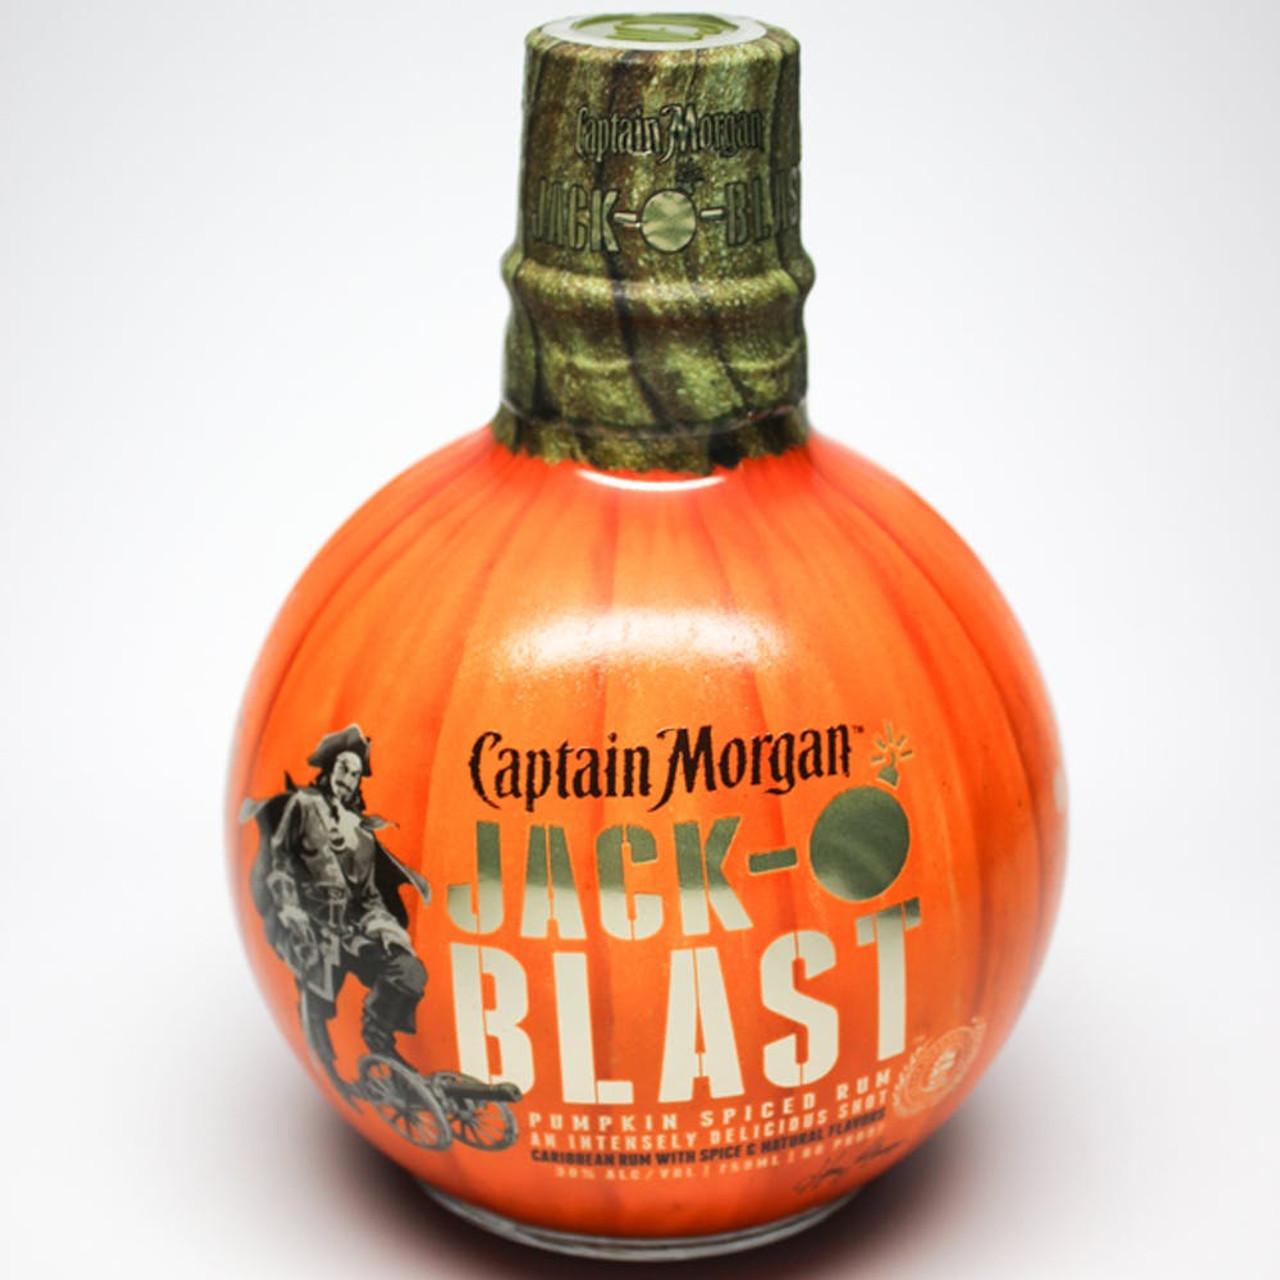 Captain Morgan Jack-O Blast Rum 750ml